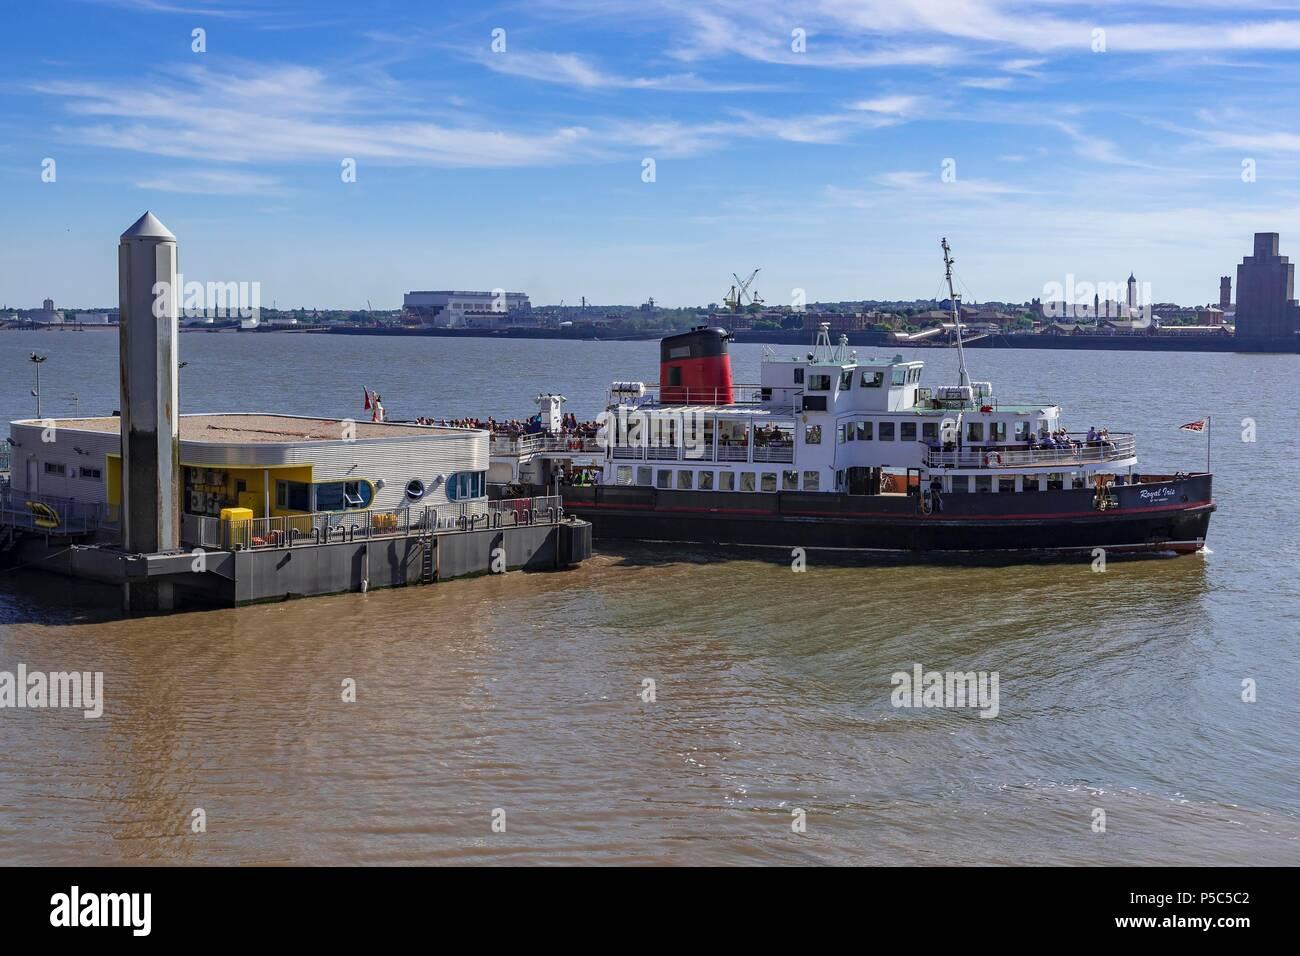 Liverpool Pierhead waterfront. North West England. Merseyside Mersey ferry Royal Iris - Stock Image